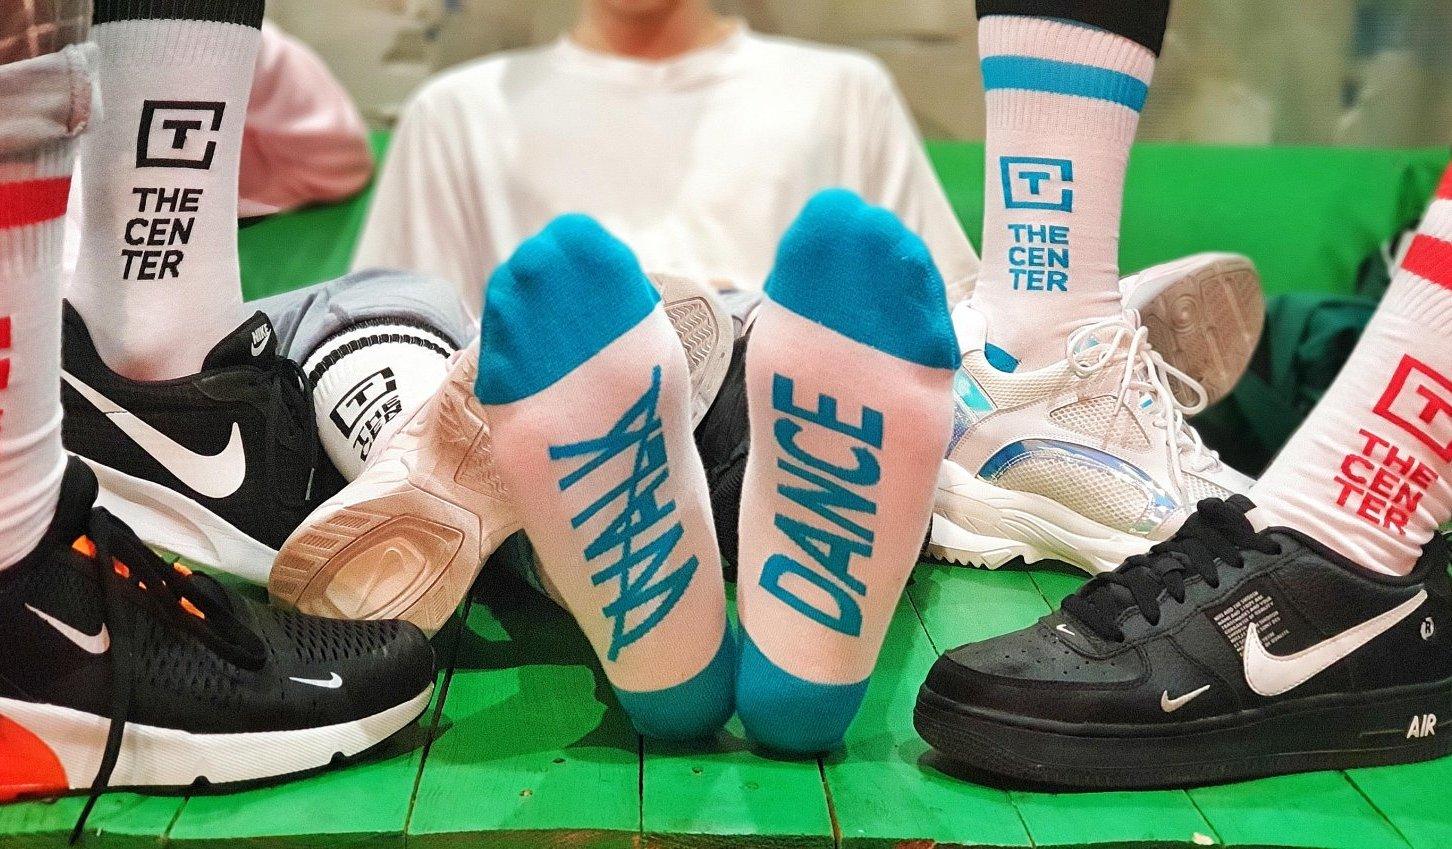 TC Socks